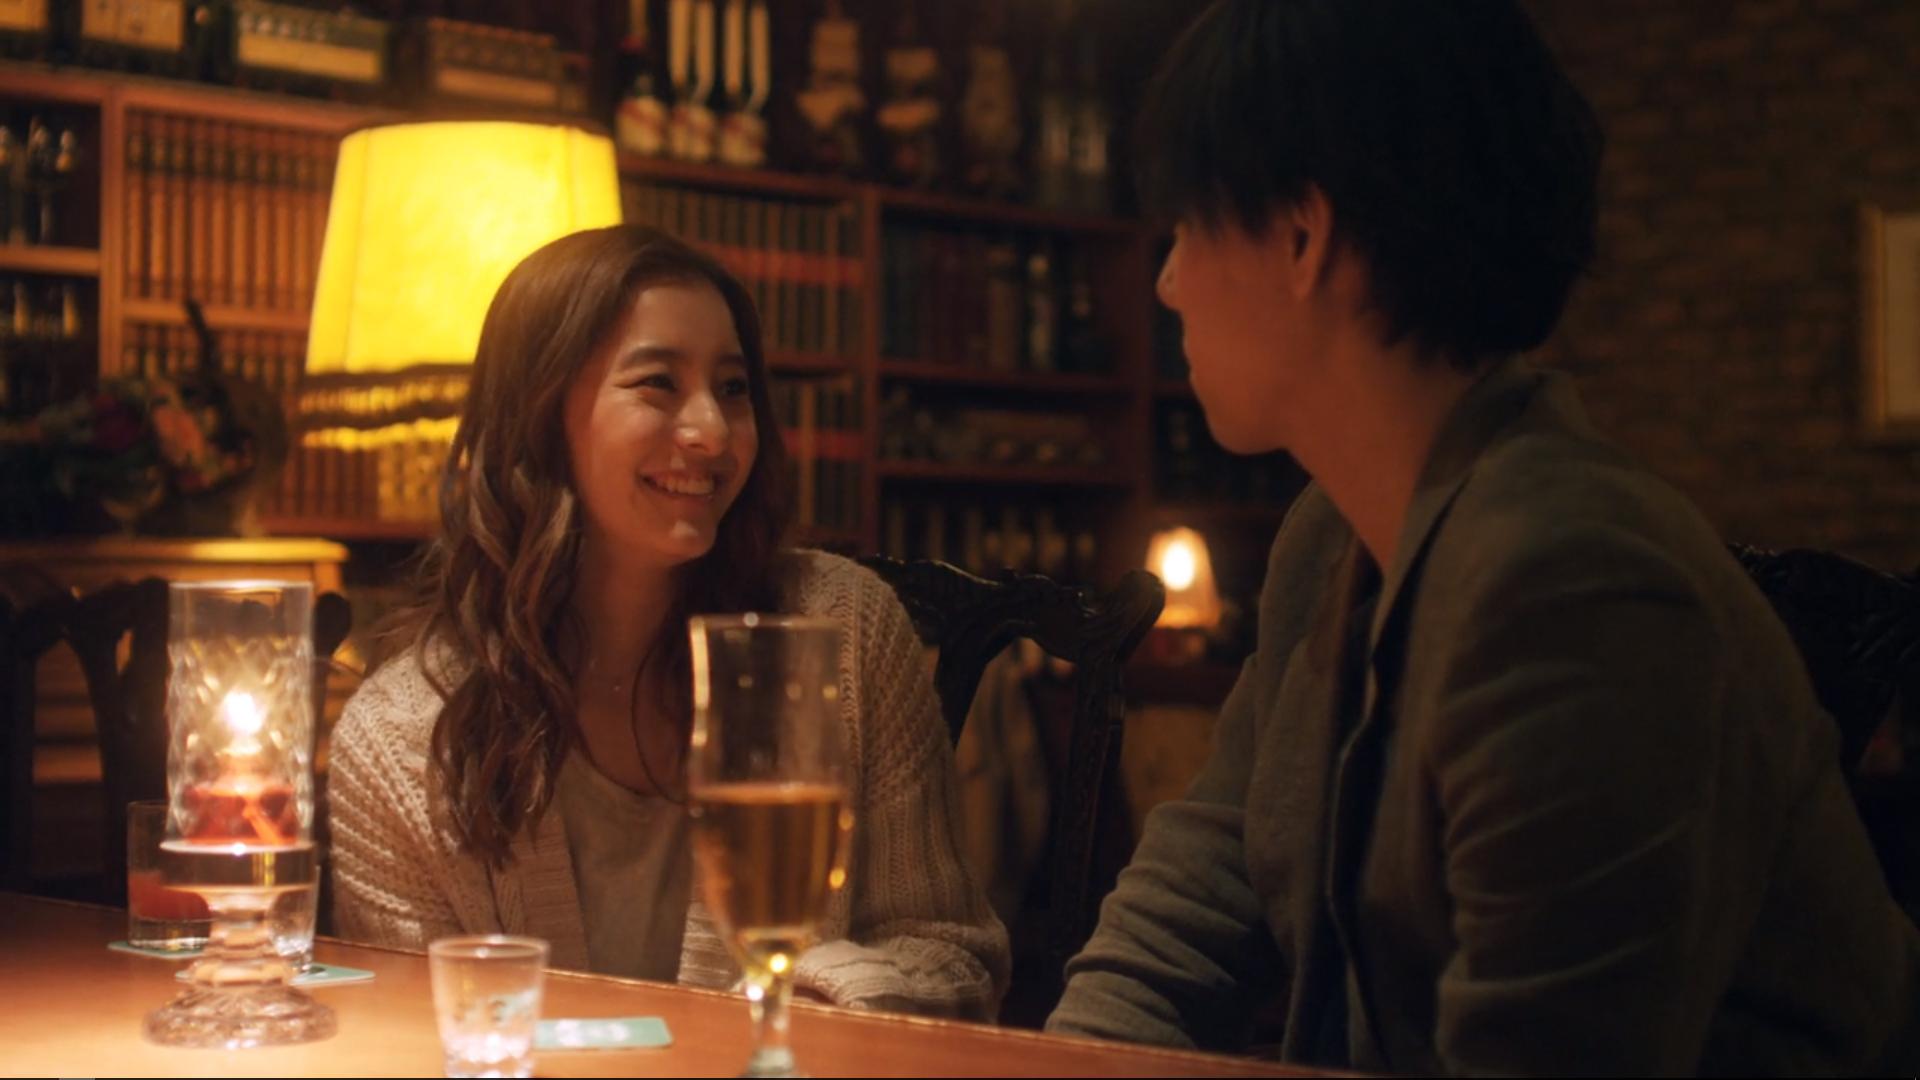 Yûko Araki and Yôjirô Noda in 1,000,000 yen no Onnatachi (2017)